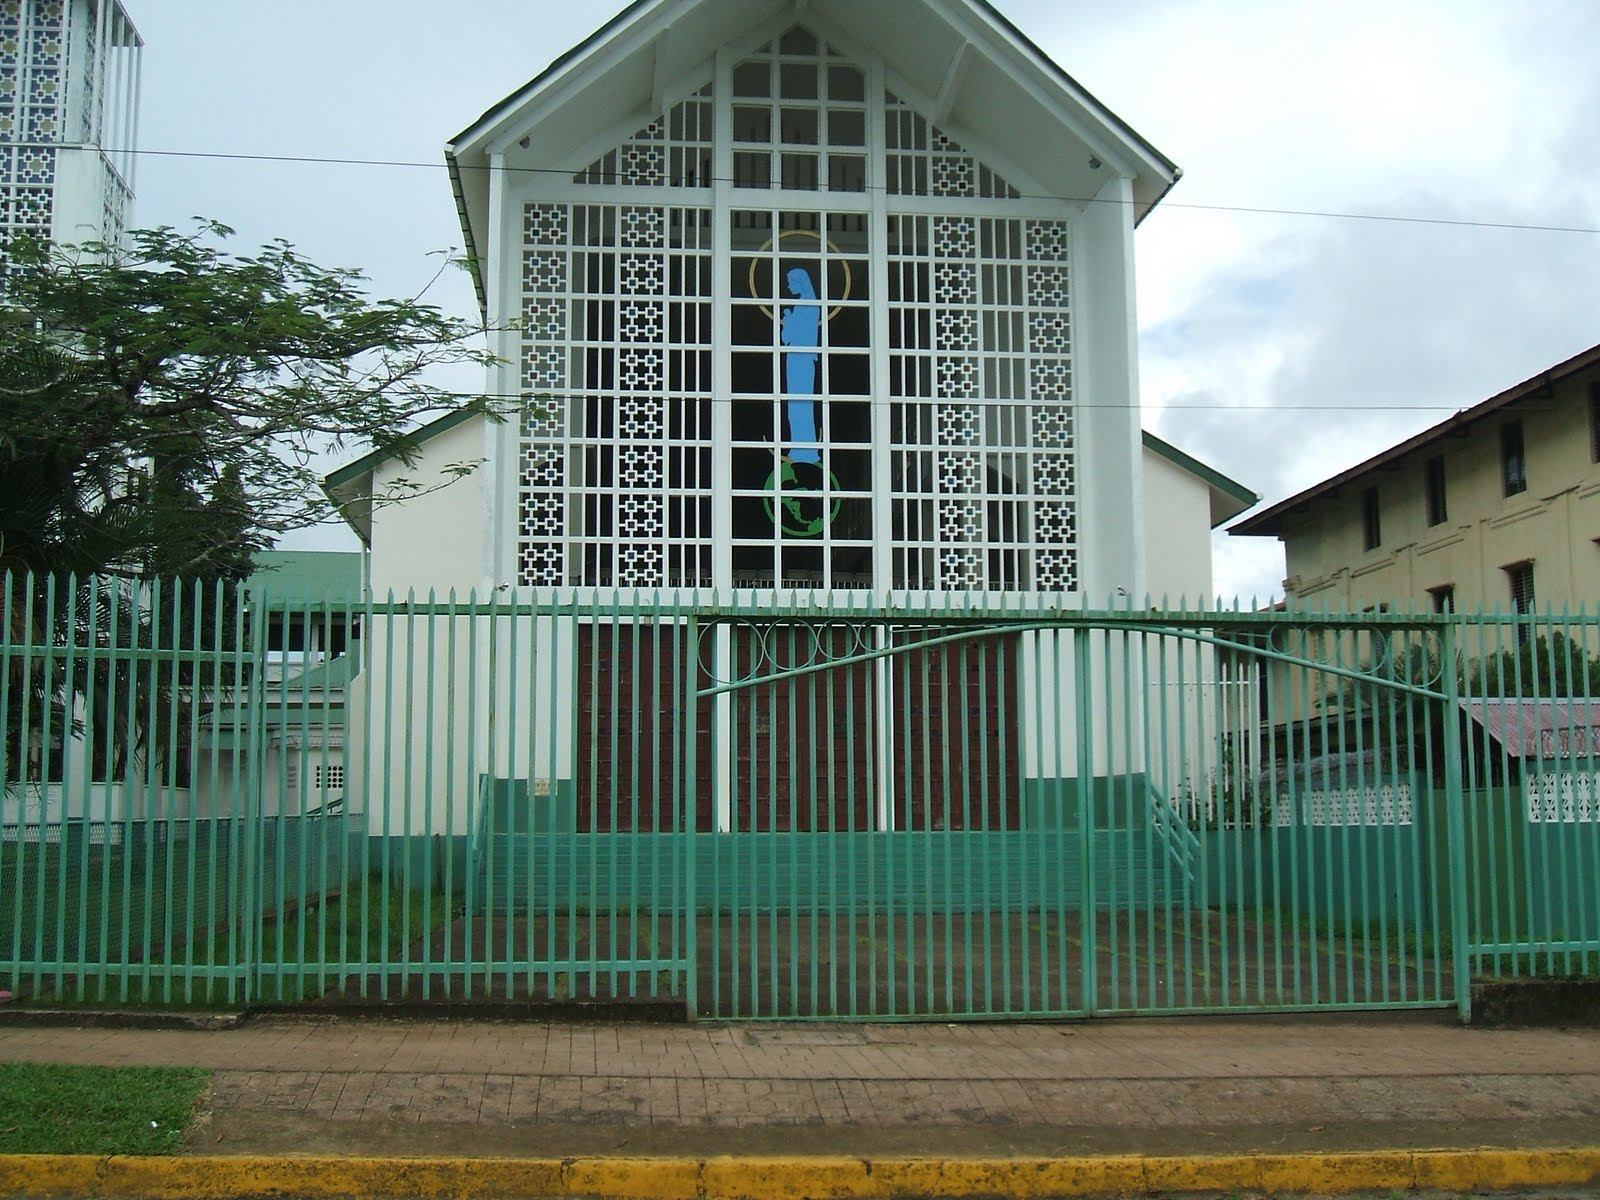 Vicariato Apostolico de Bluefields